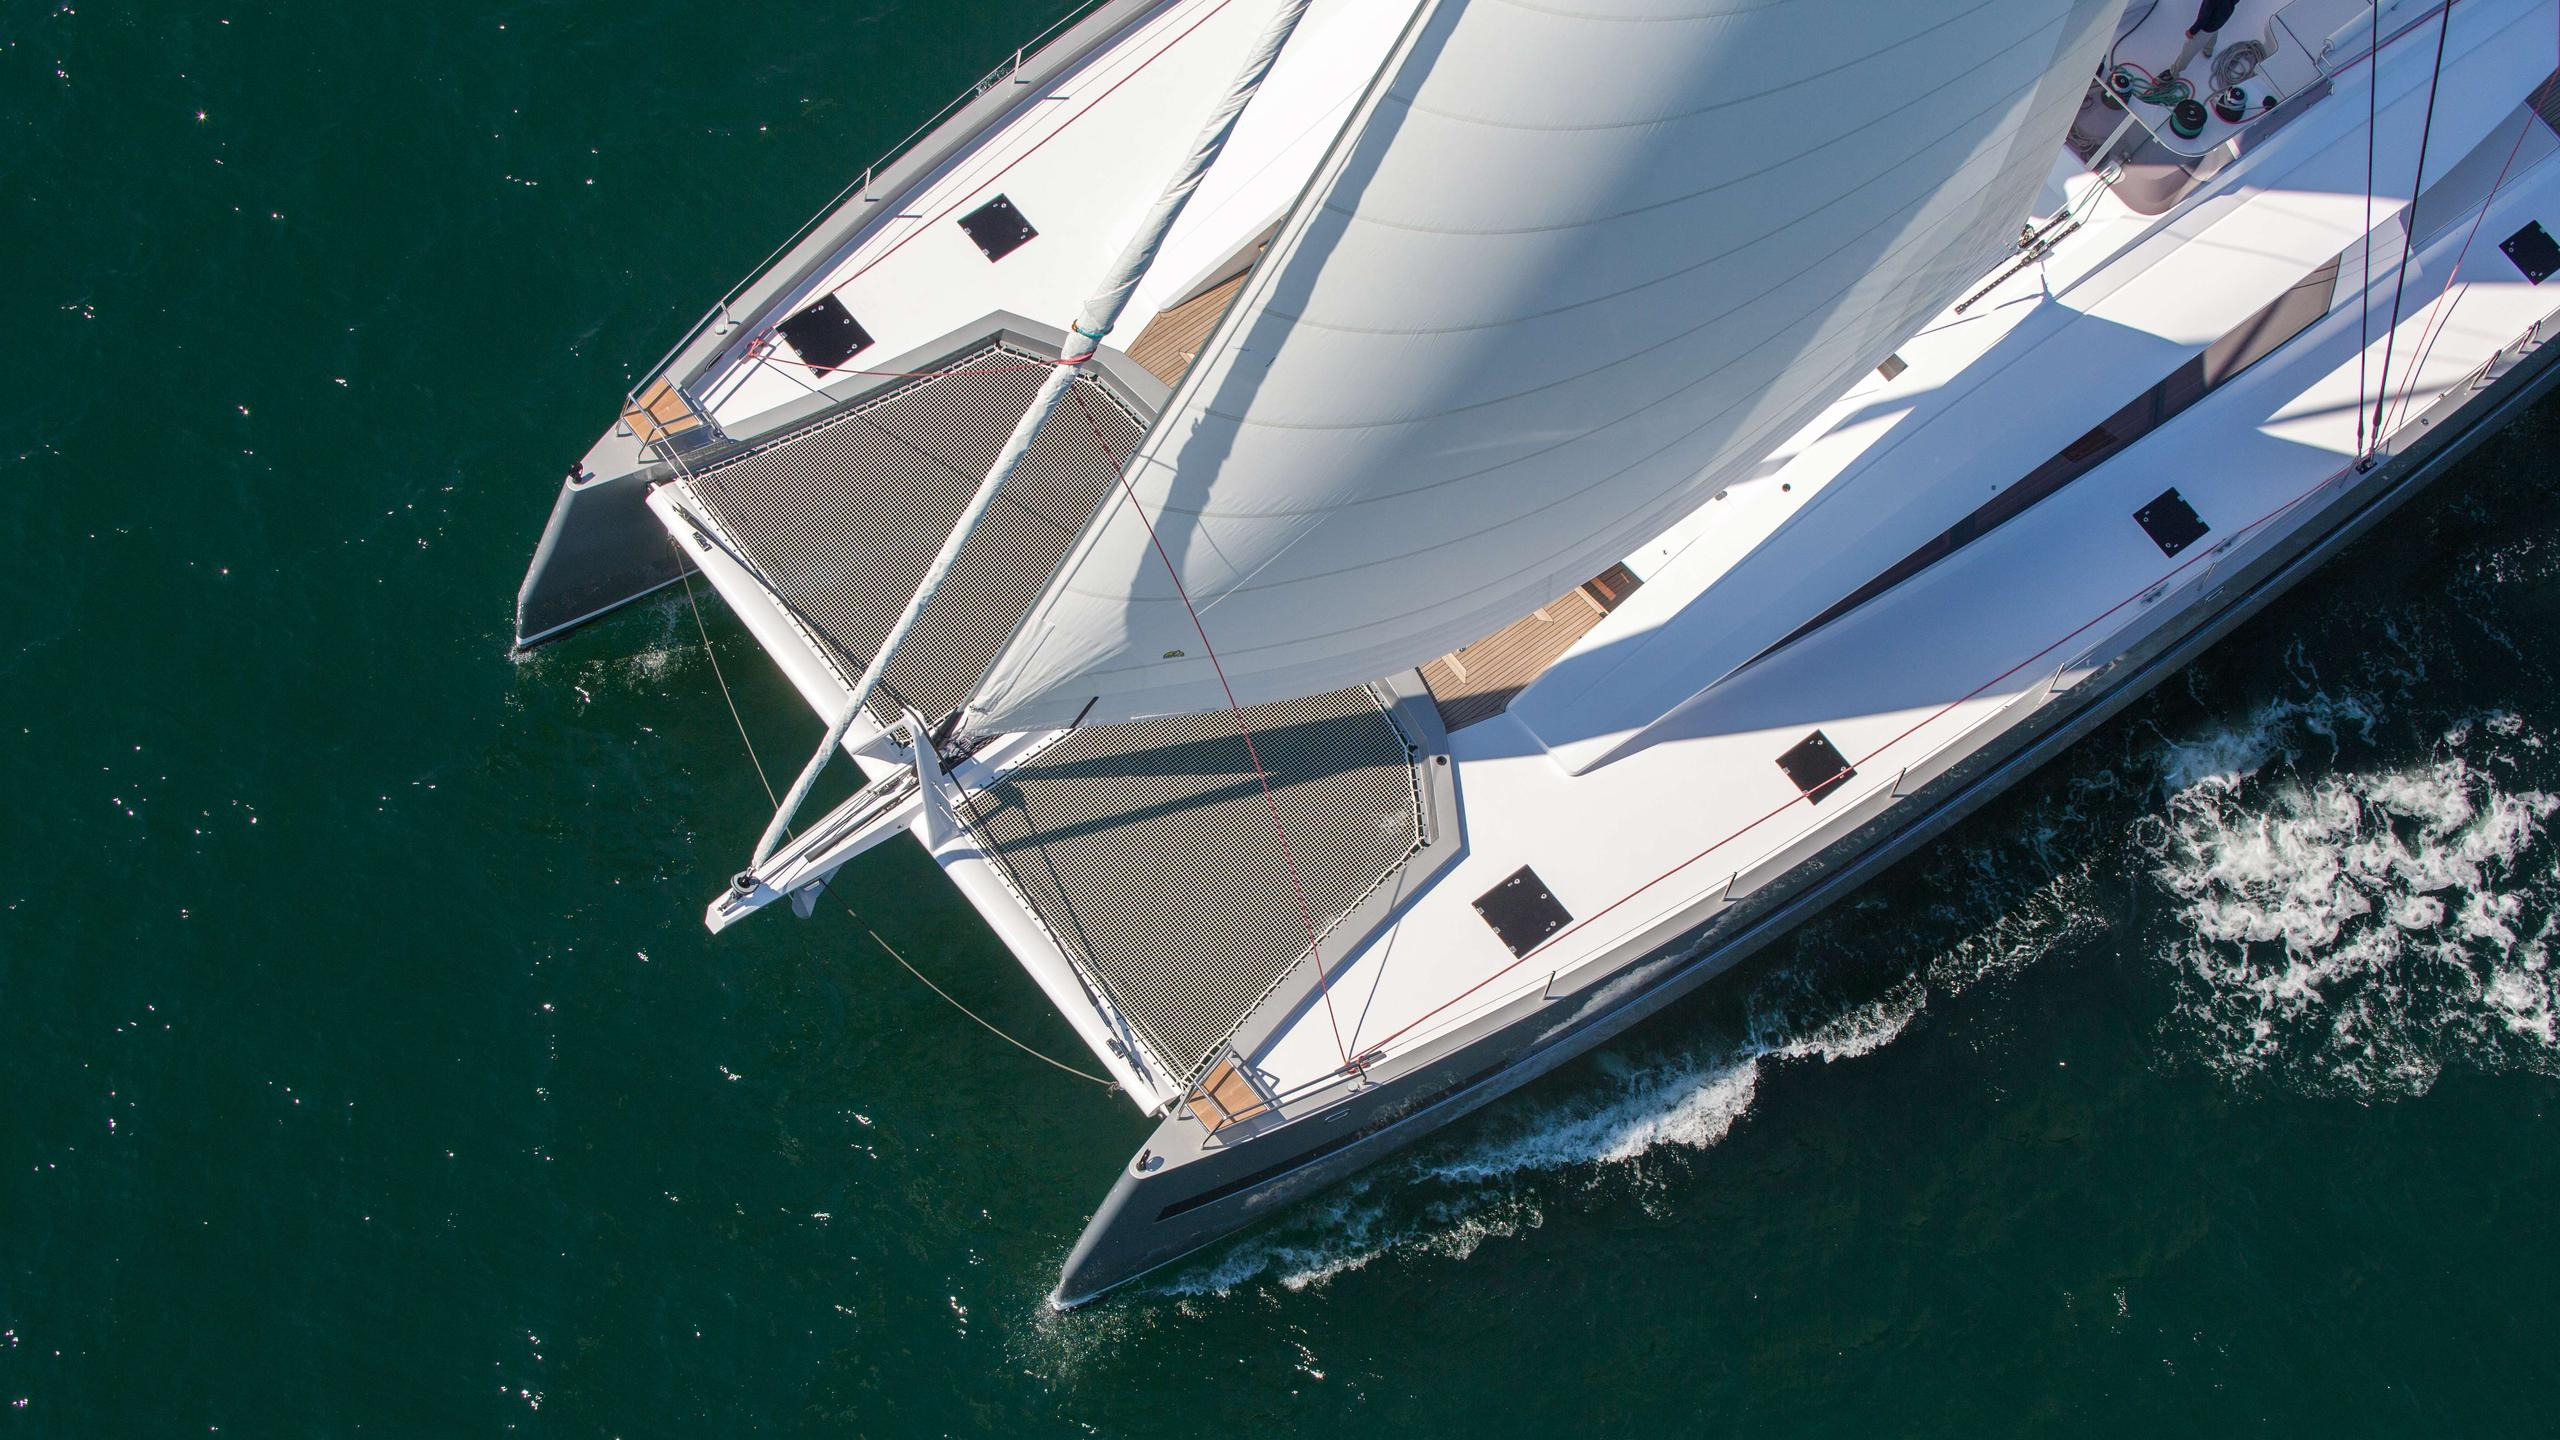 Windquest-catamaran-yacht-jfa-2014-26m-aerial-deck